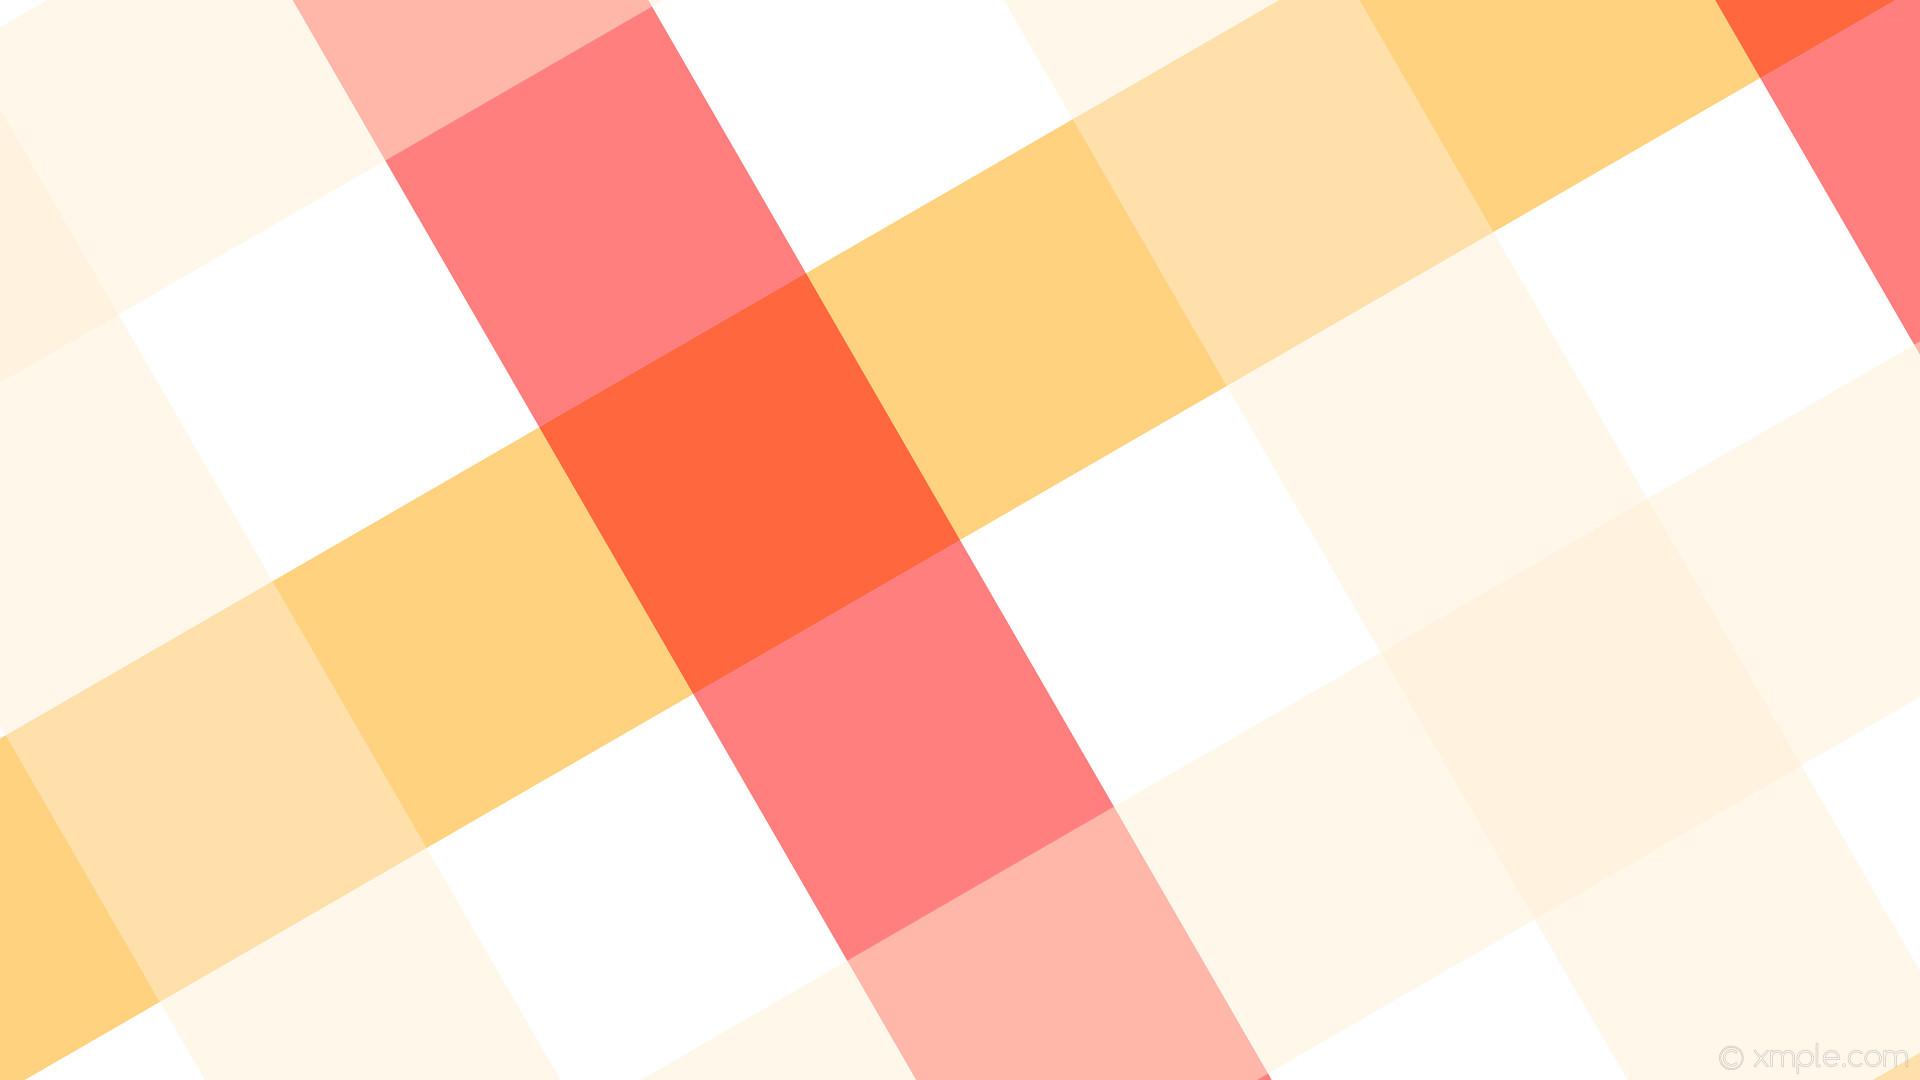 wallpaper red white quad gingham striped yellow orange papaya whip #ffffff  #ffa500 #ff0000